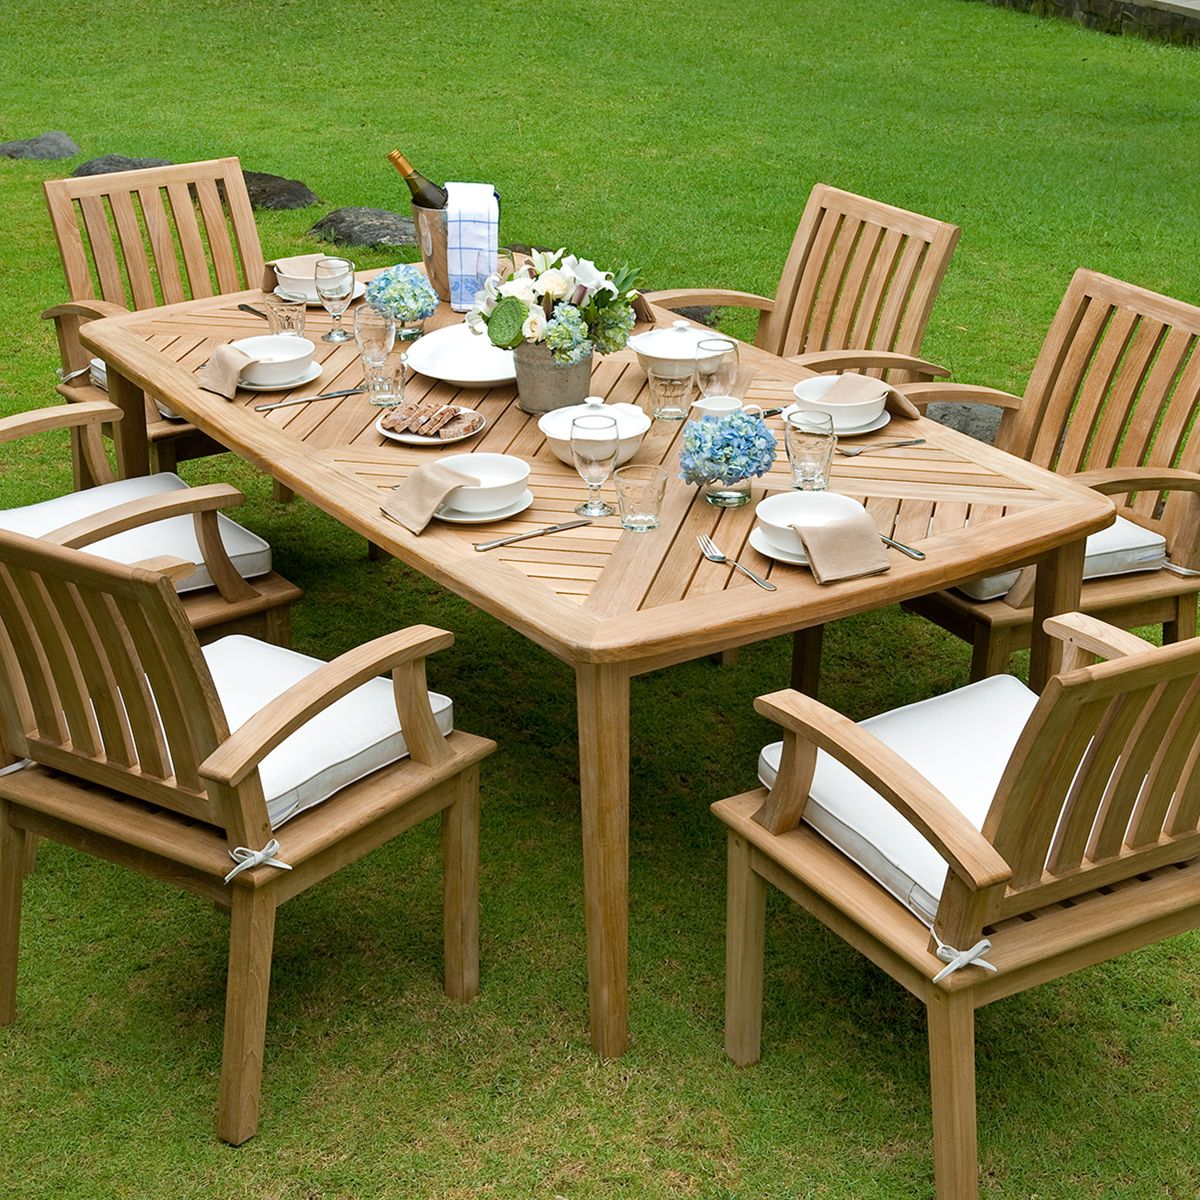 Veranda Dining Table In 2019 Cdj Hilton Head House Pinterest